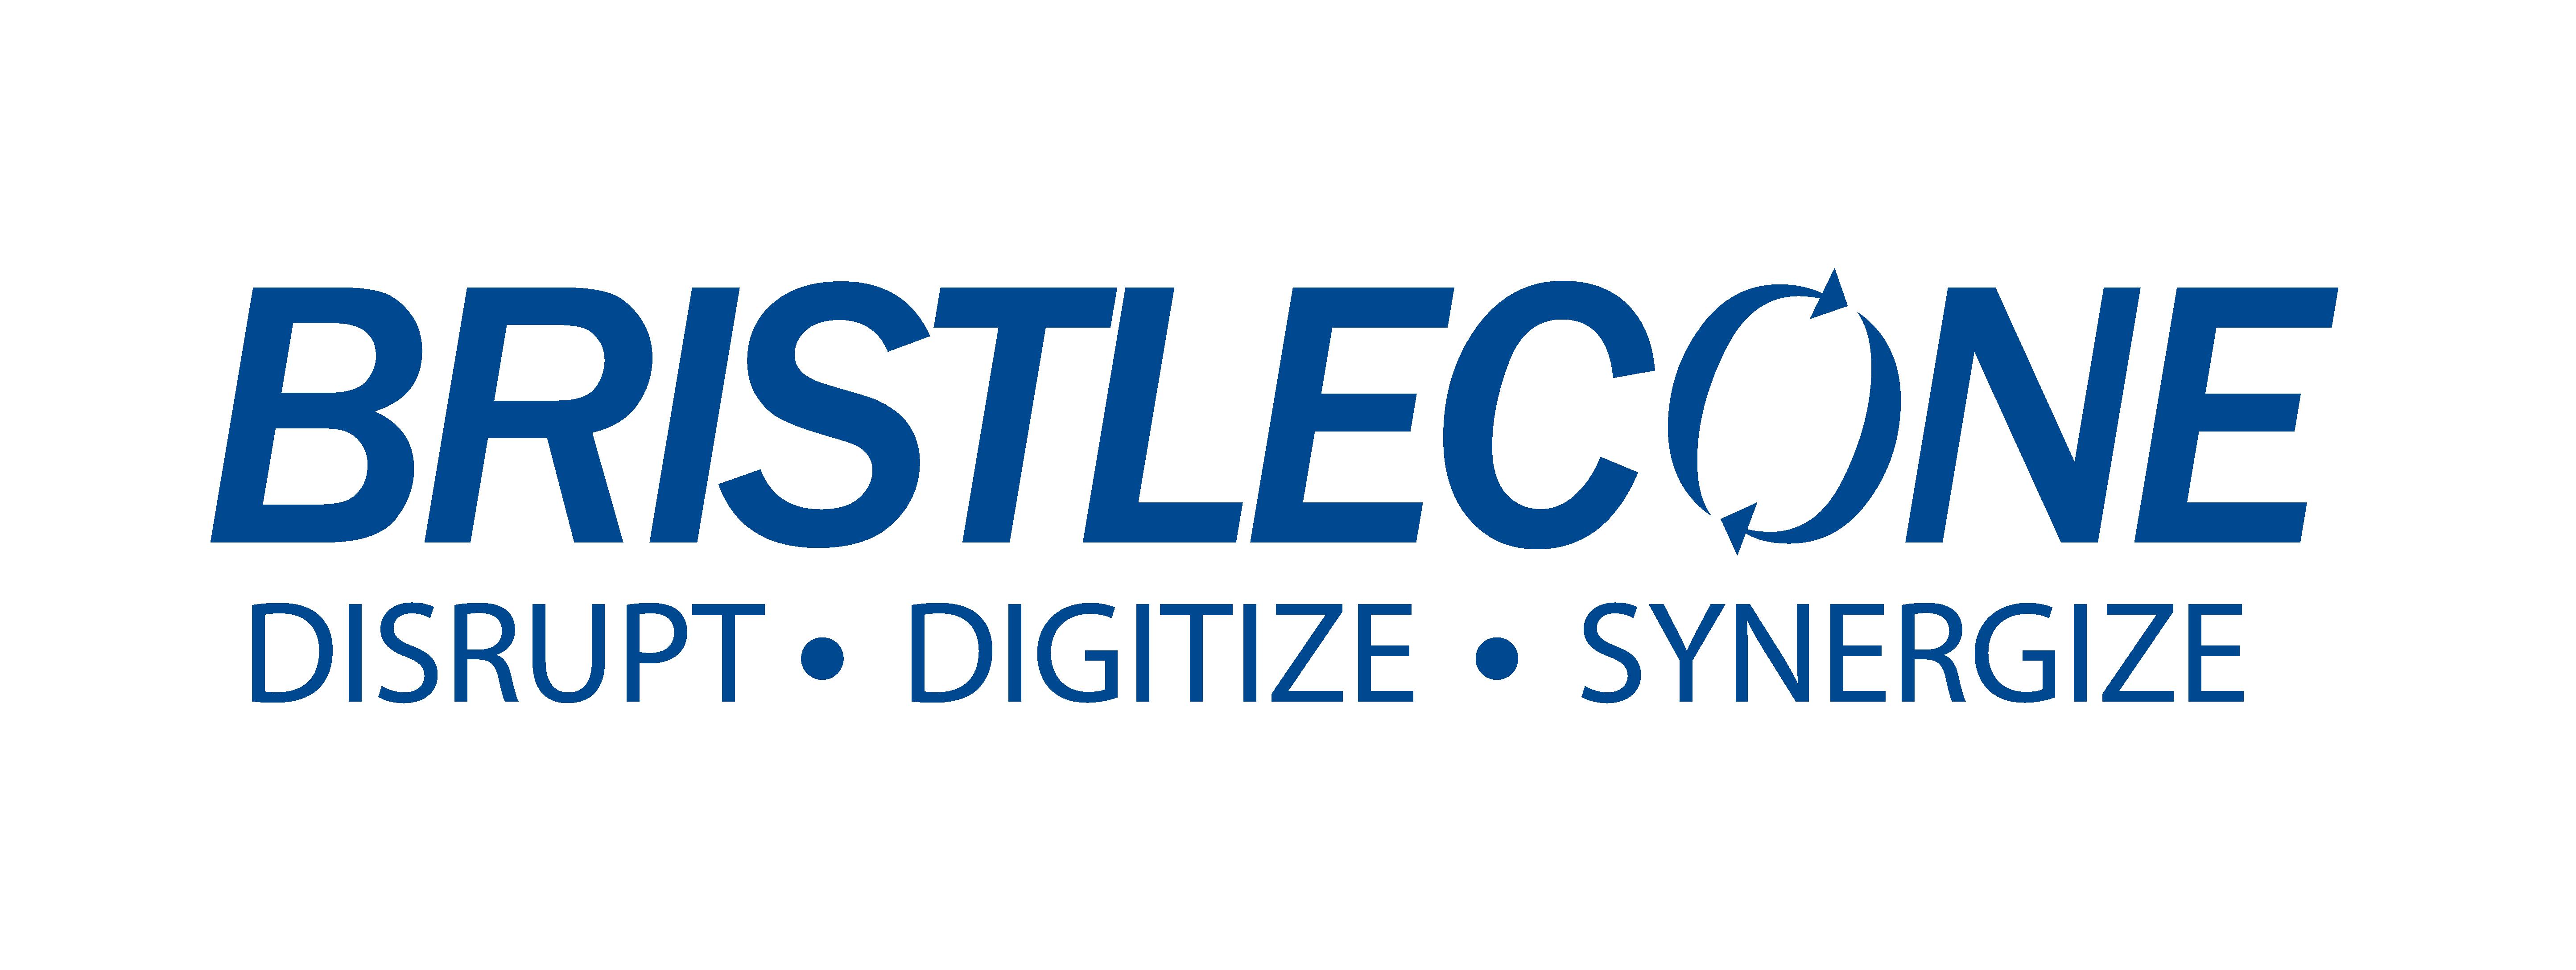 Bristlecone Logo_Blue_Dec 2016-01